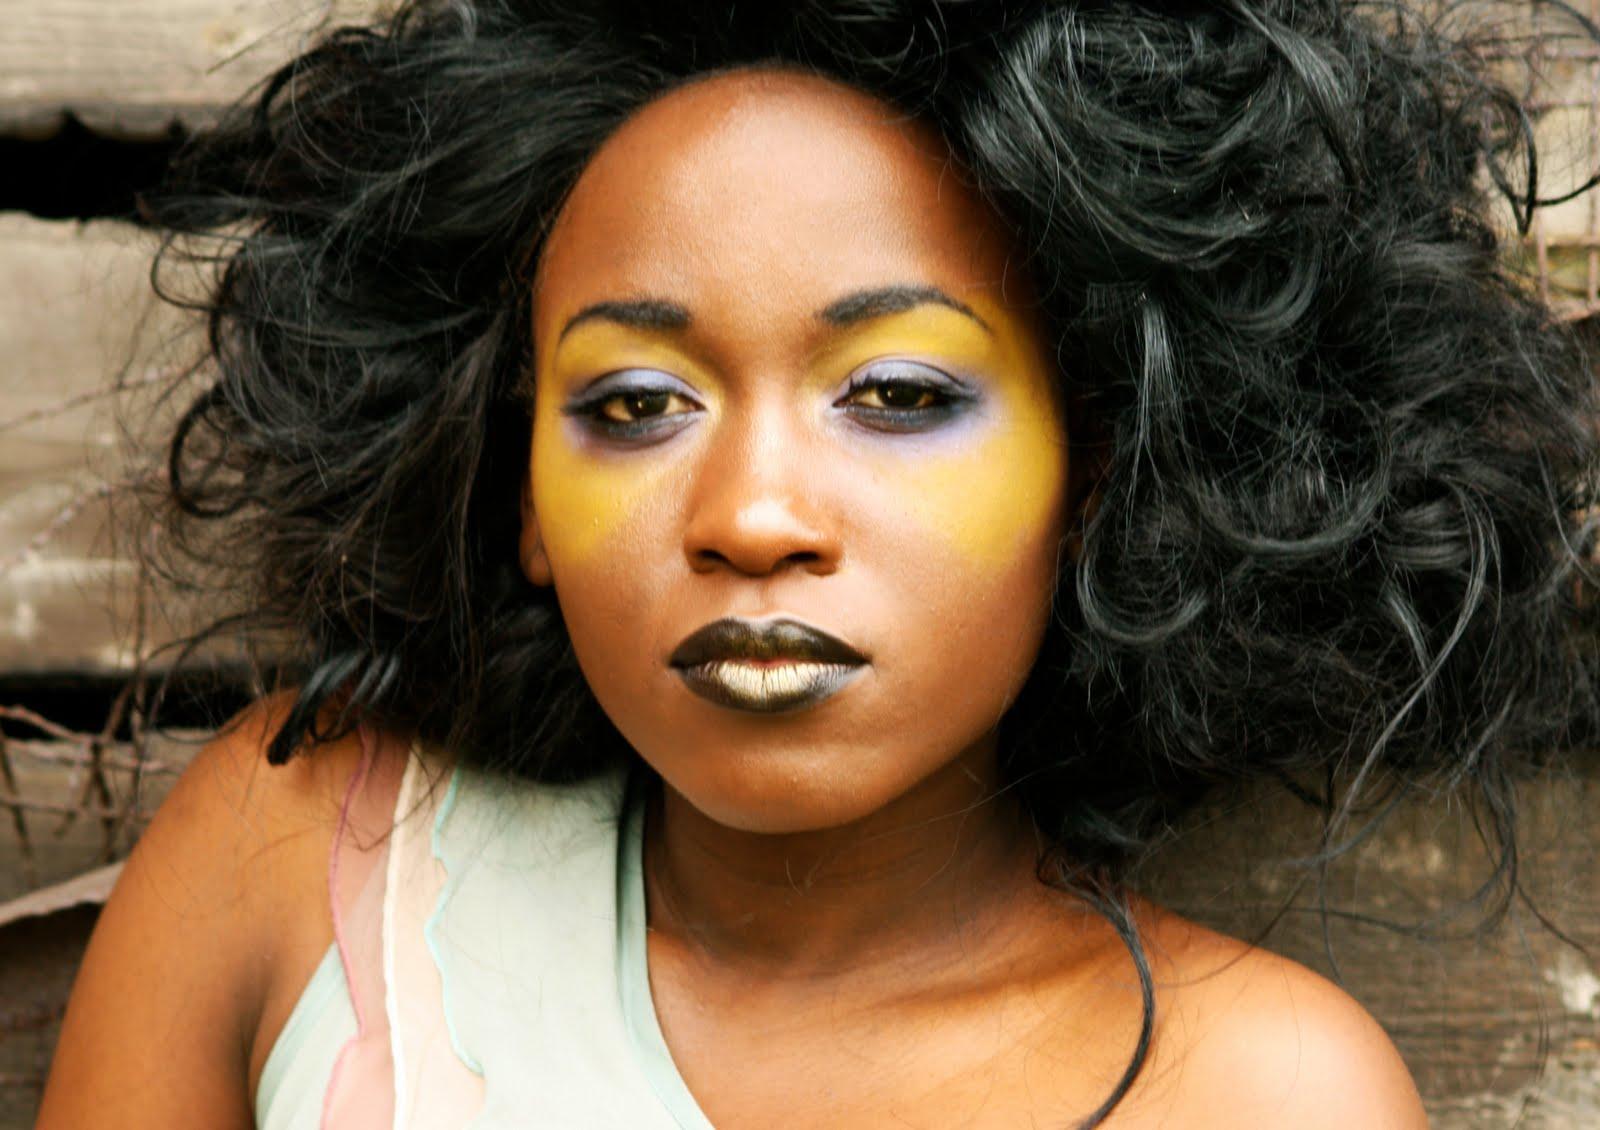 Hair And Makeup Artistry: Harry Jon Freelance Hair & Makeup Artist: Freelance Hair